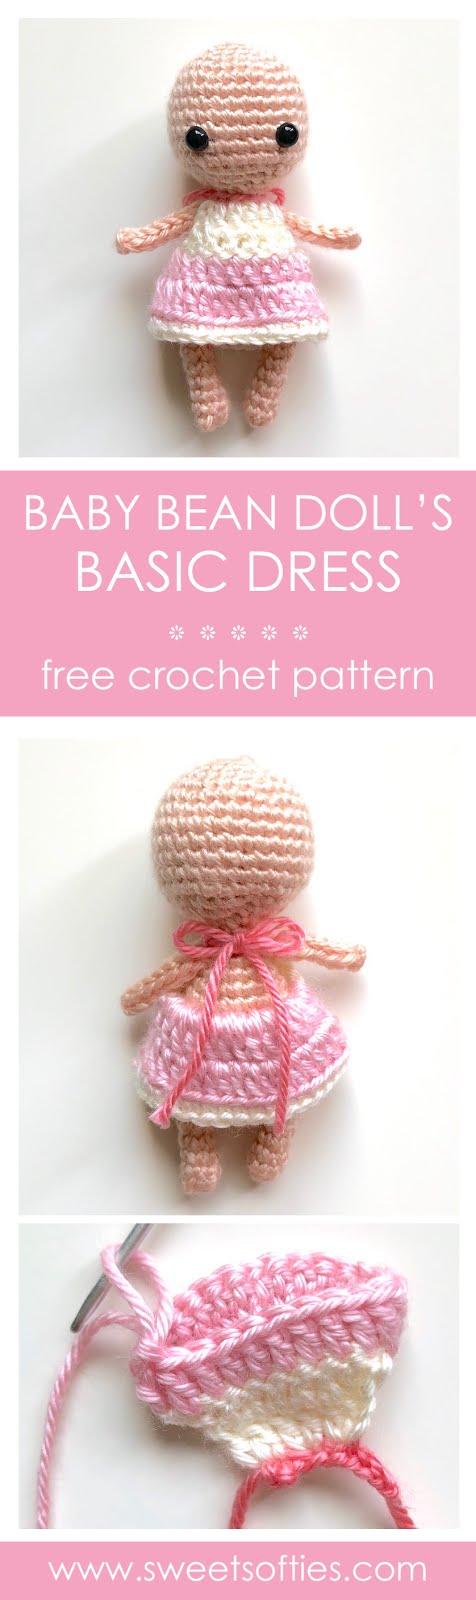 12+ Free Crochet Doll Clothes Patterns | FaveCrafts.com | 1600x476